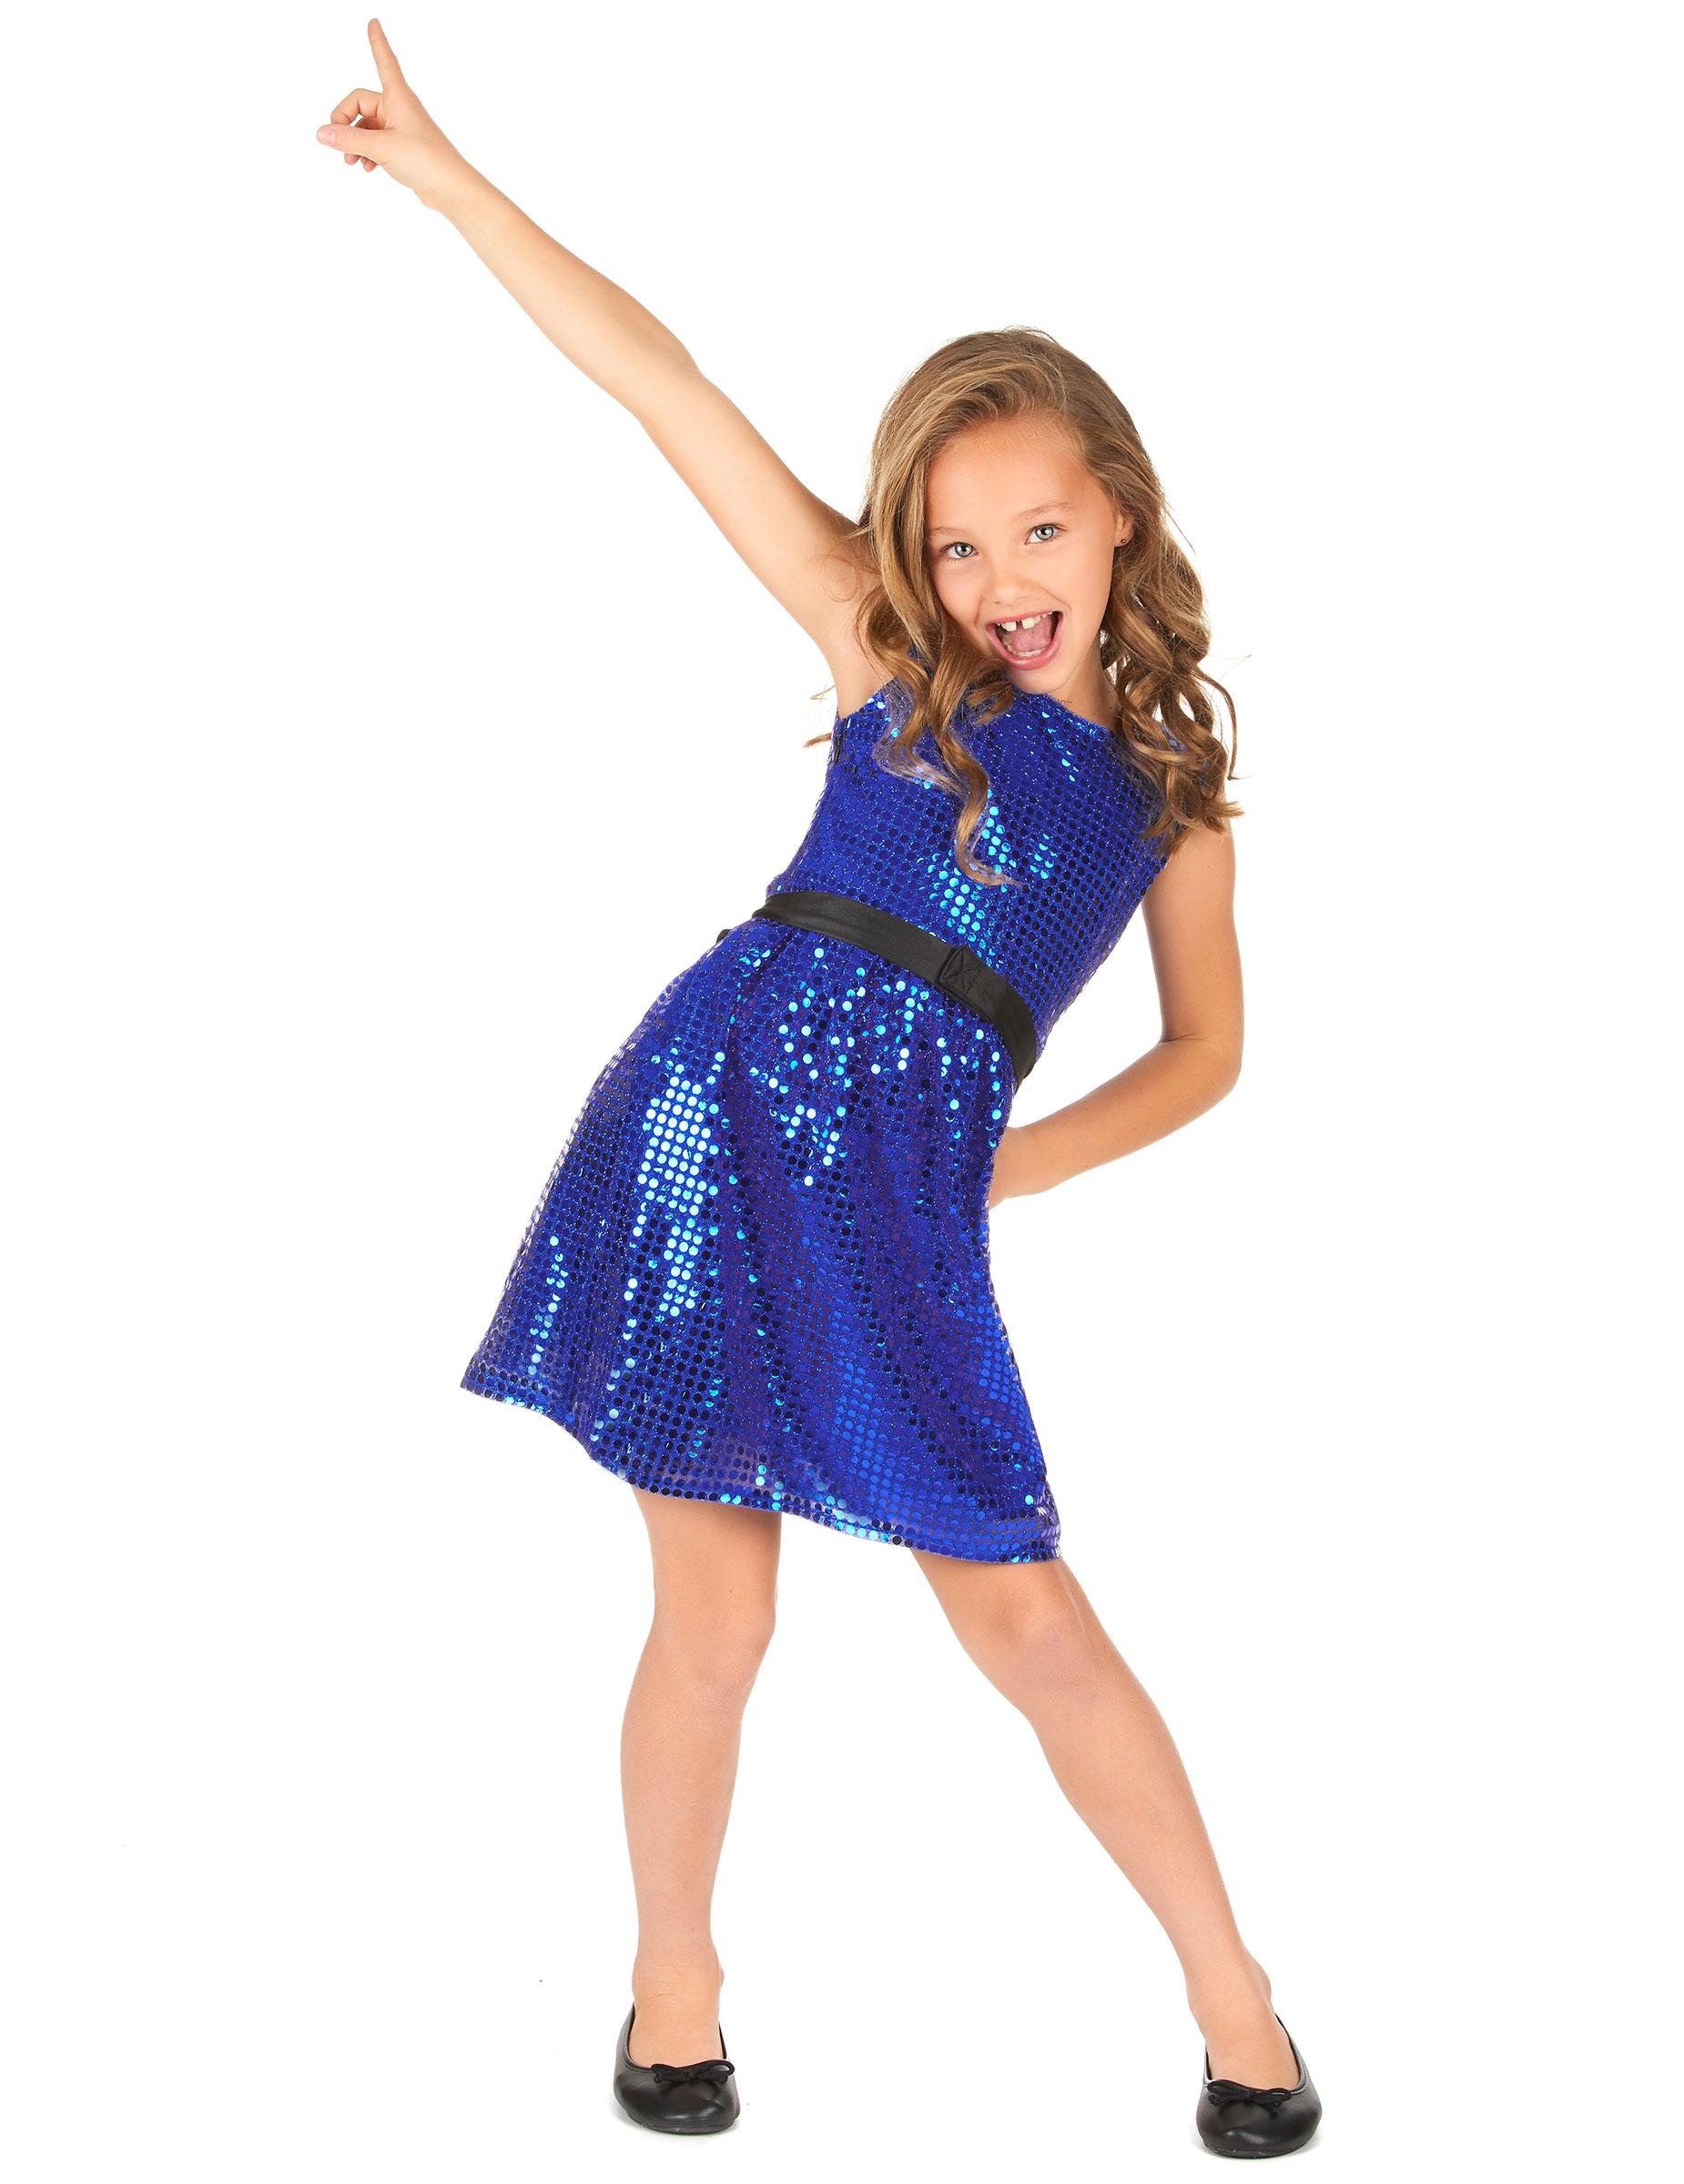 Blauwe jurk 134